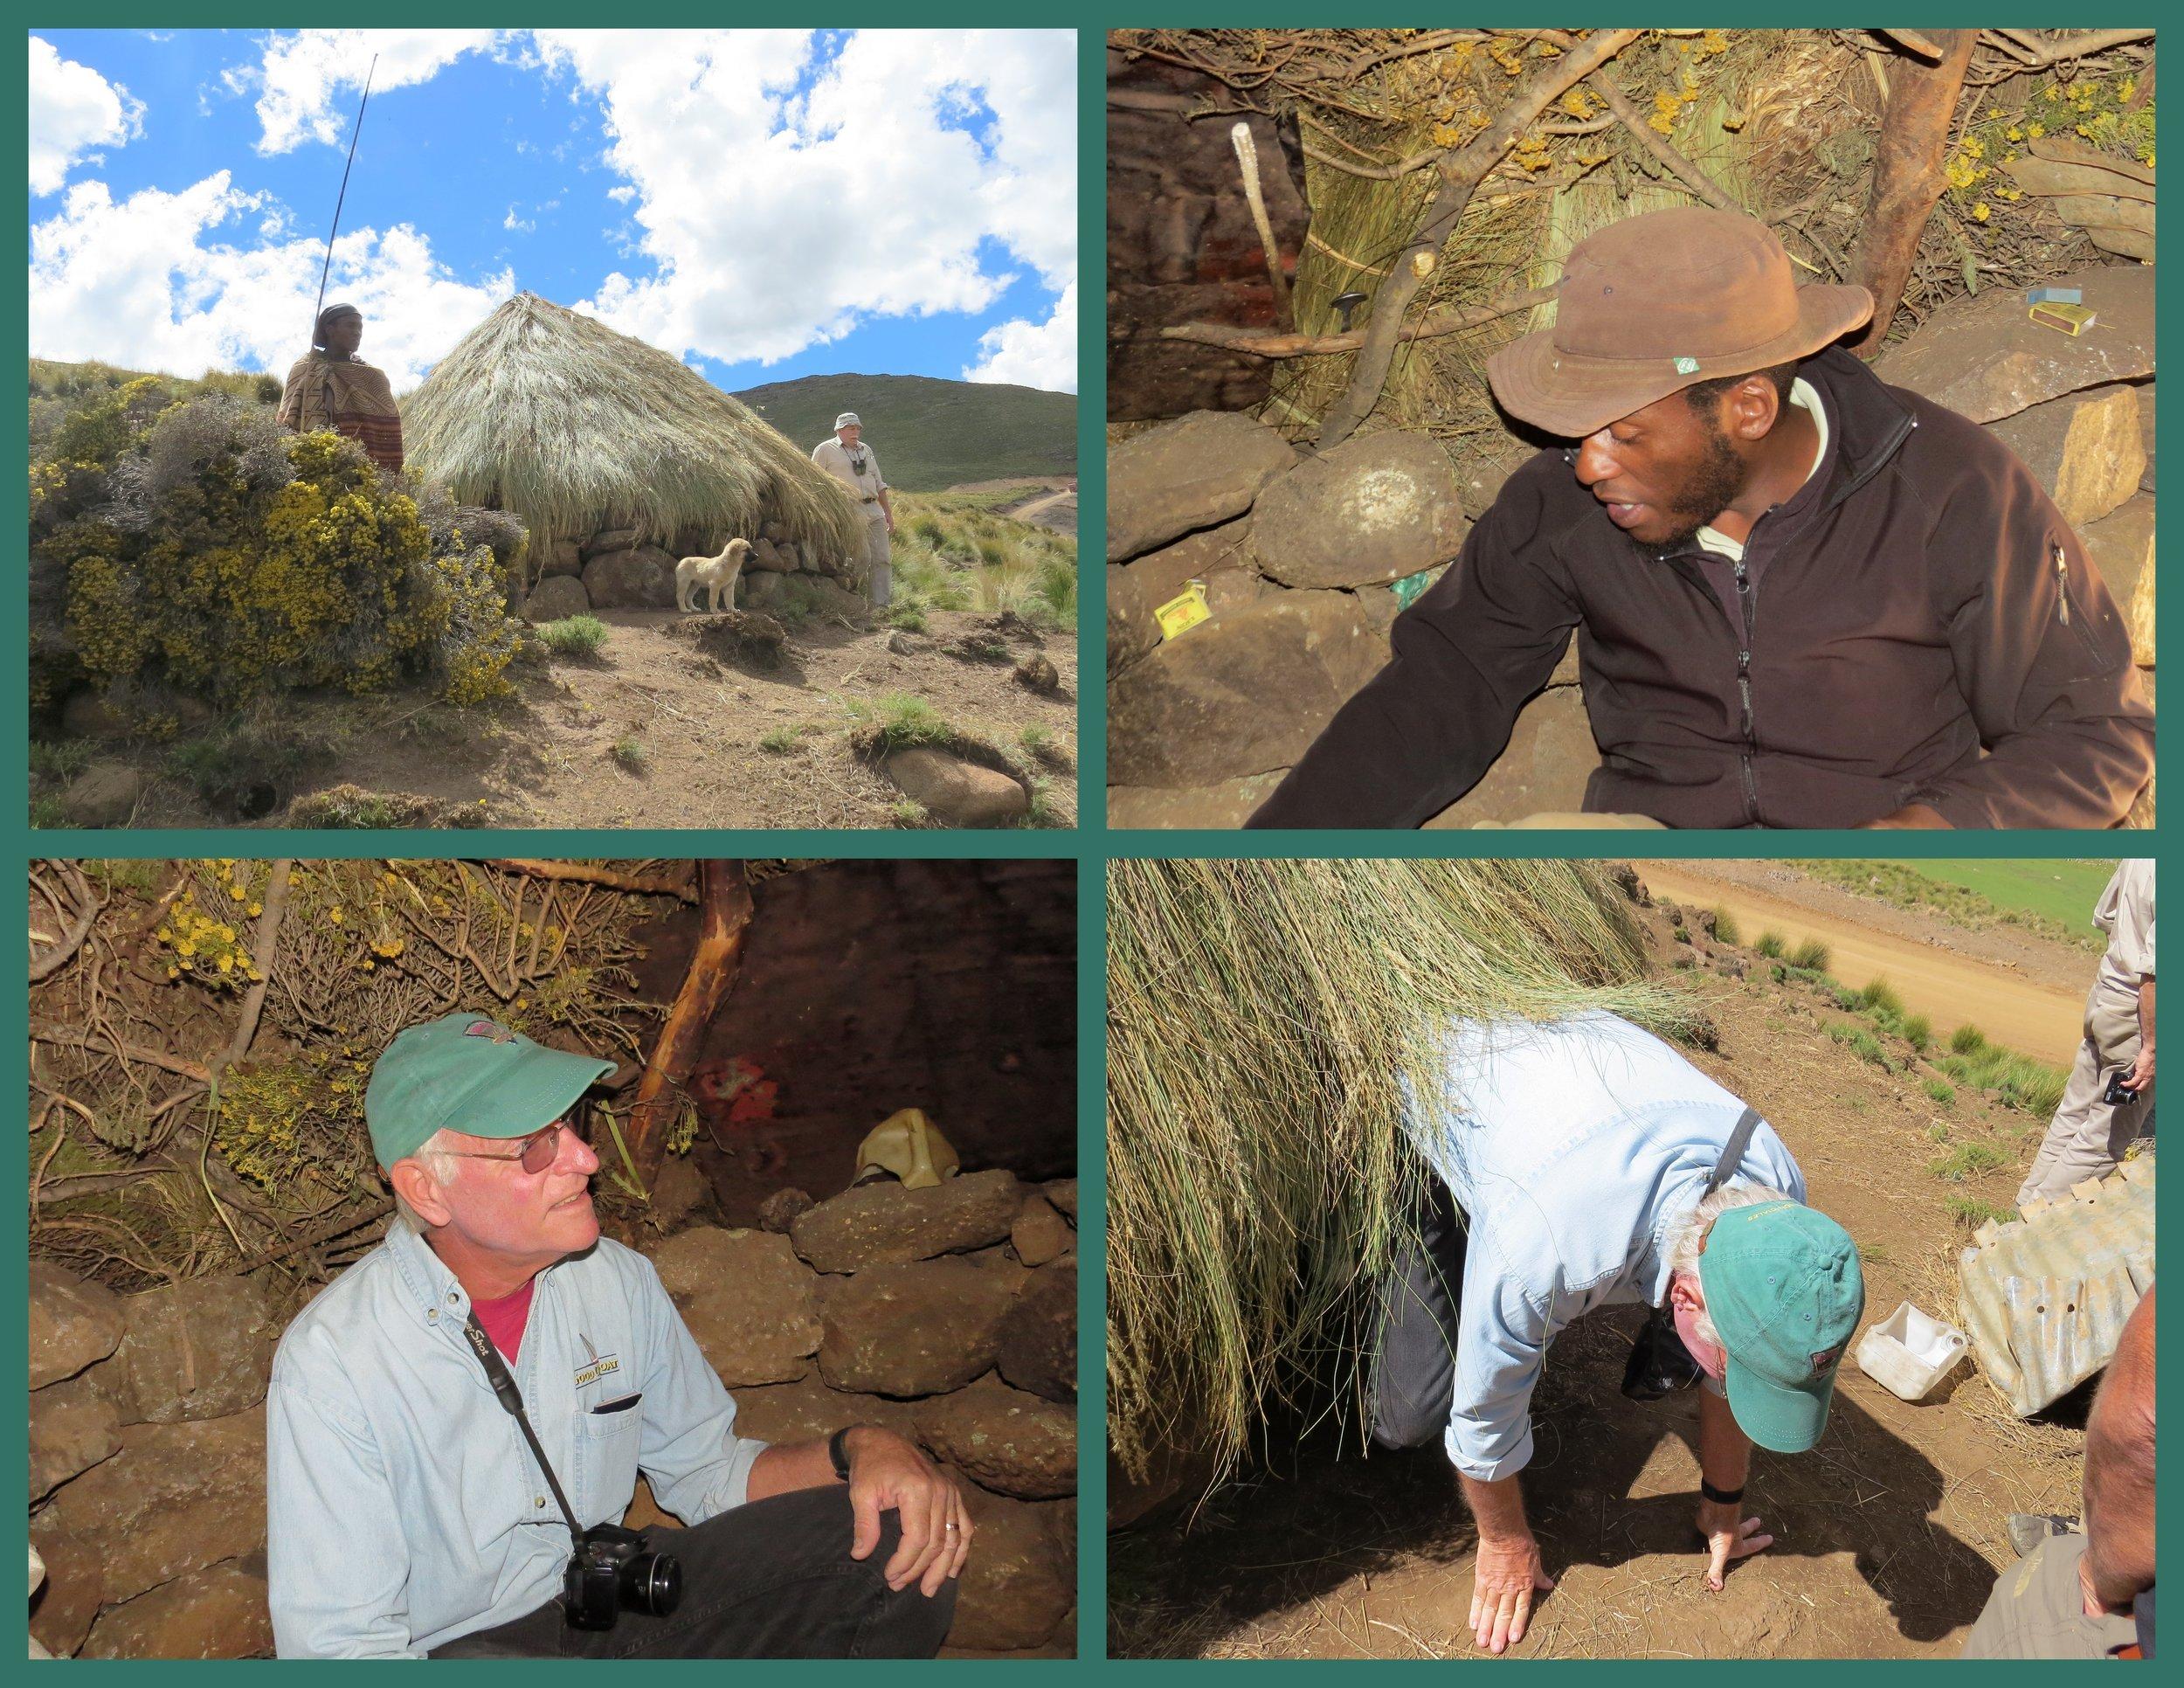 Visiting a shepherd's hut